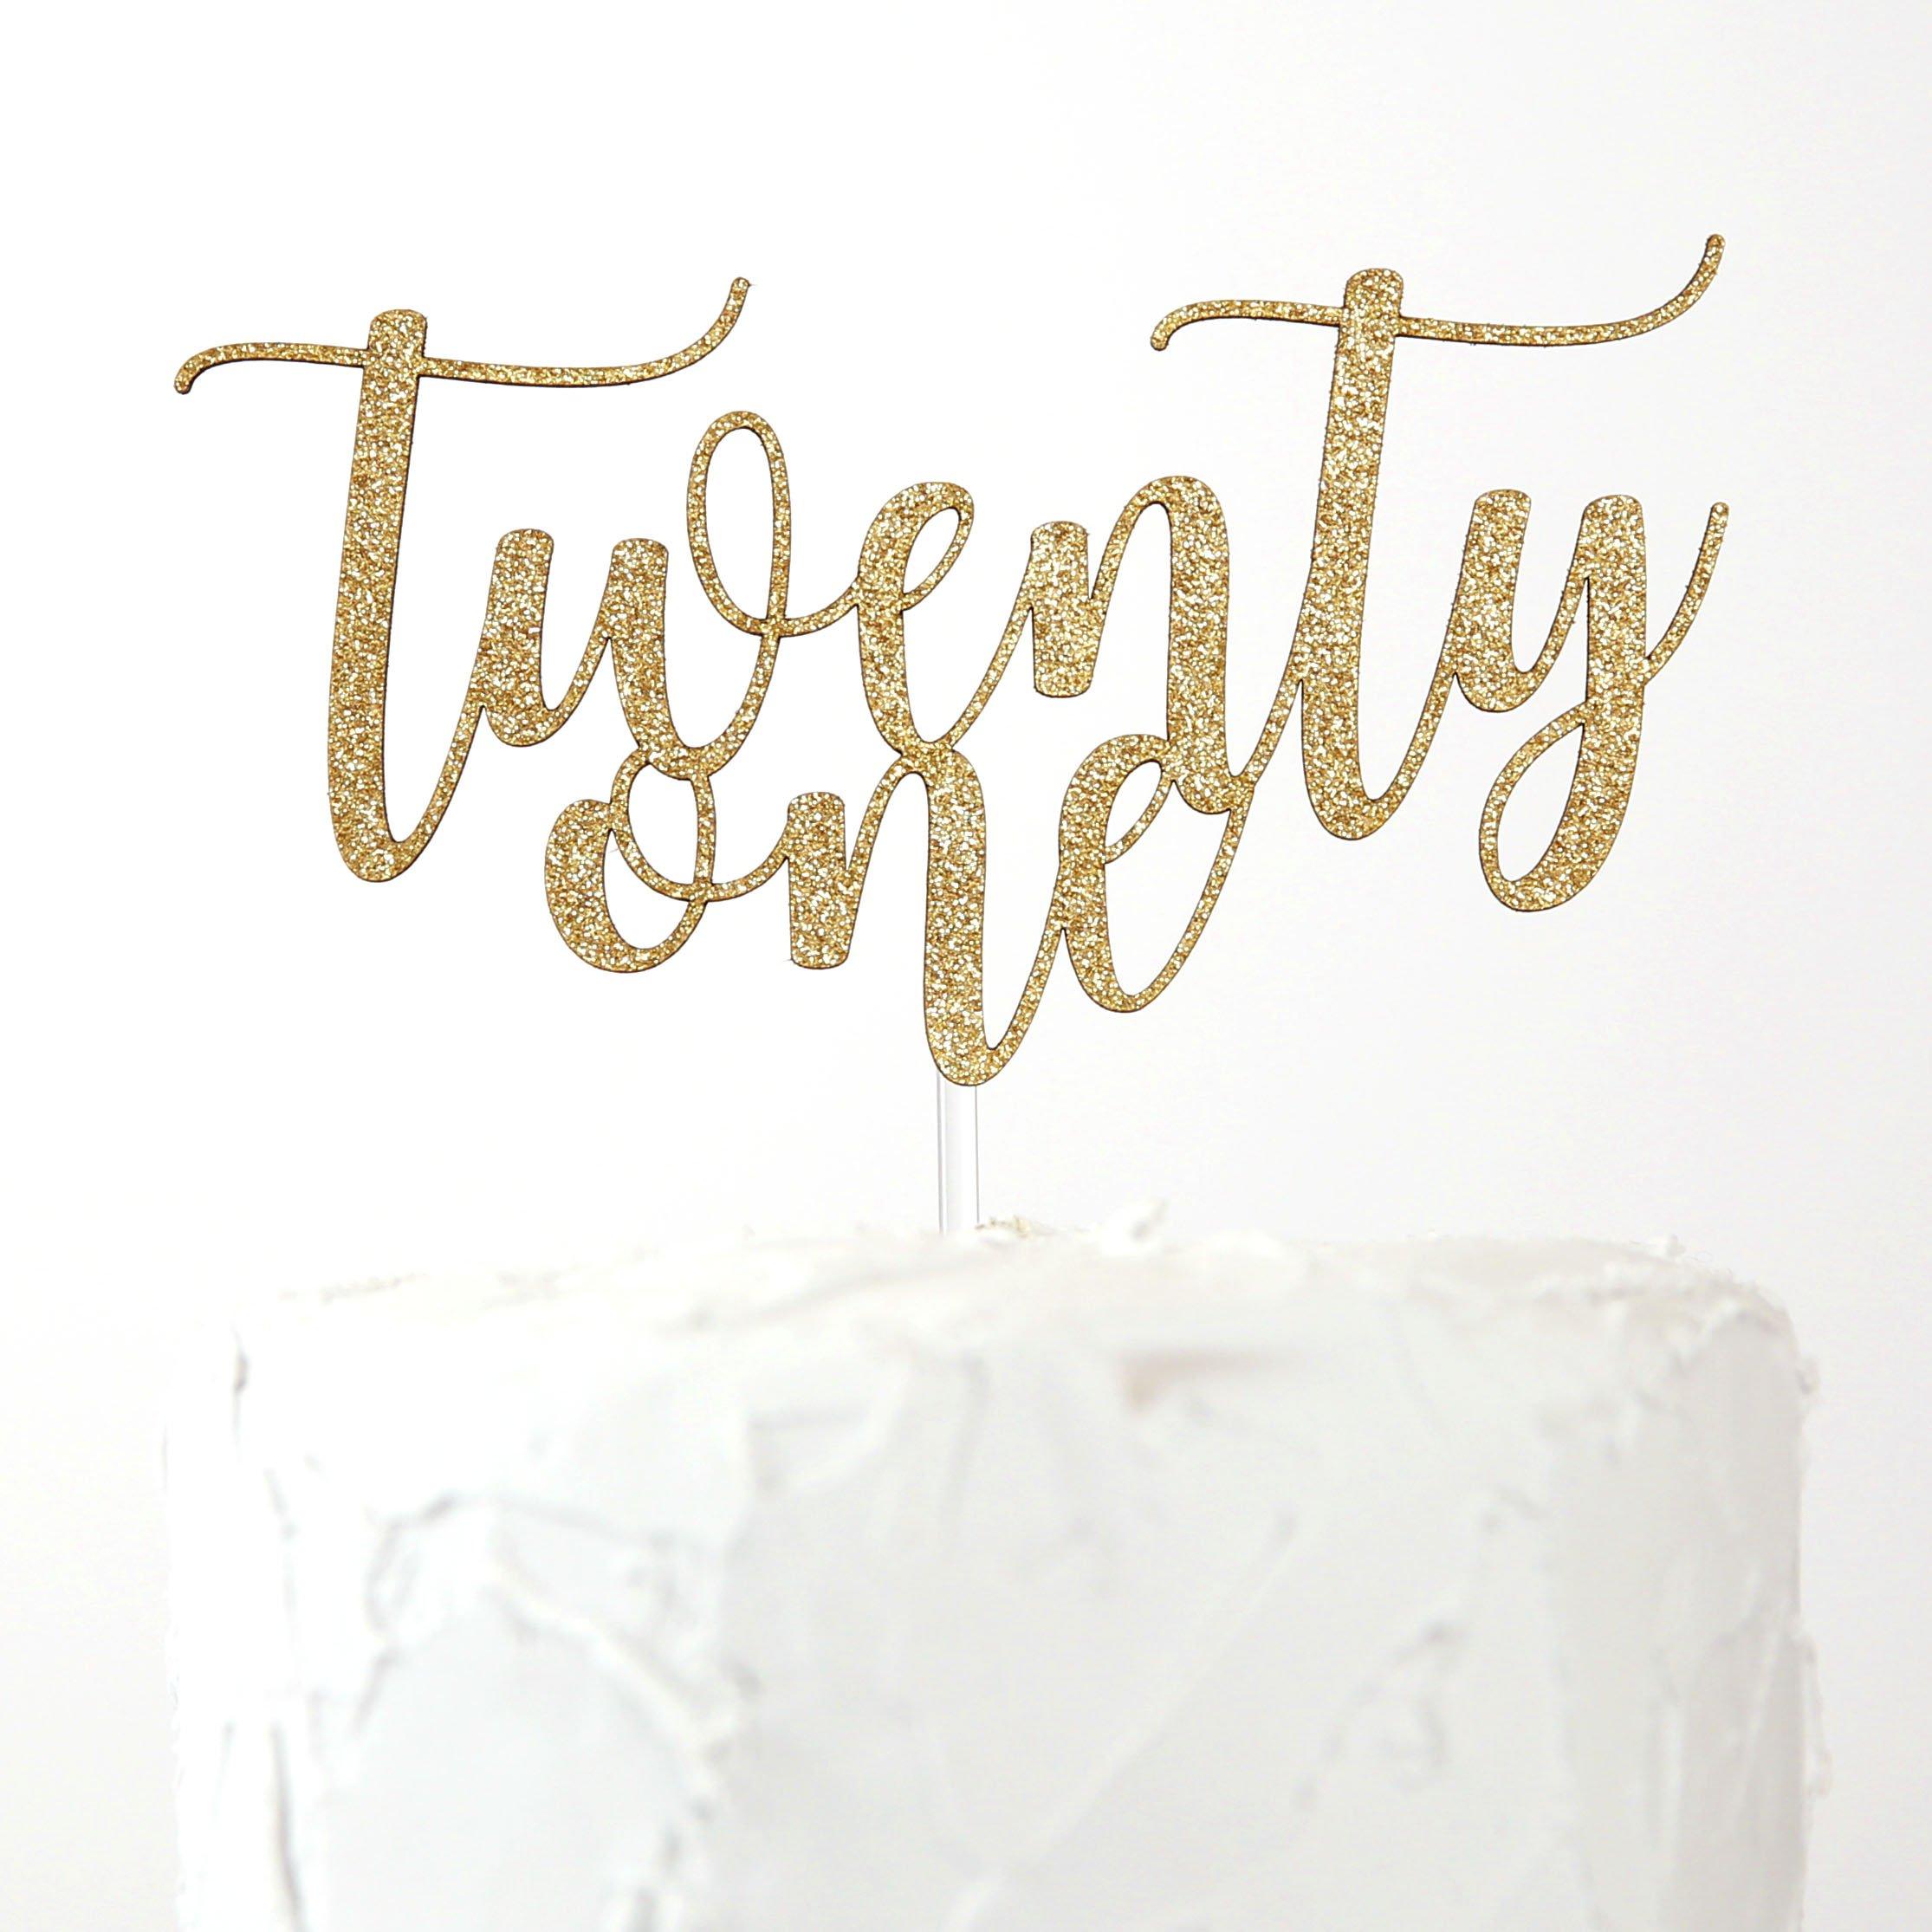 NANASUKO 21st Birthday Cake Topper - twenty-one - Premium quality Made in USA